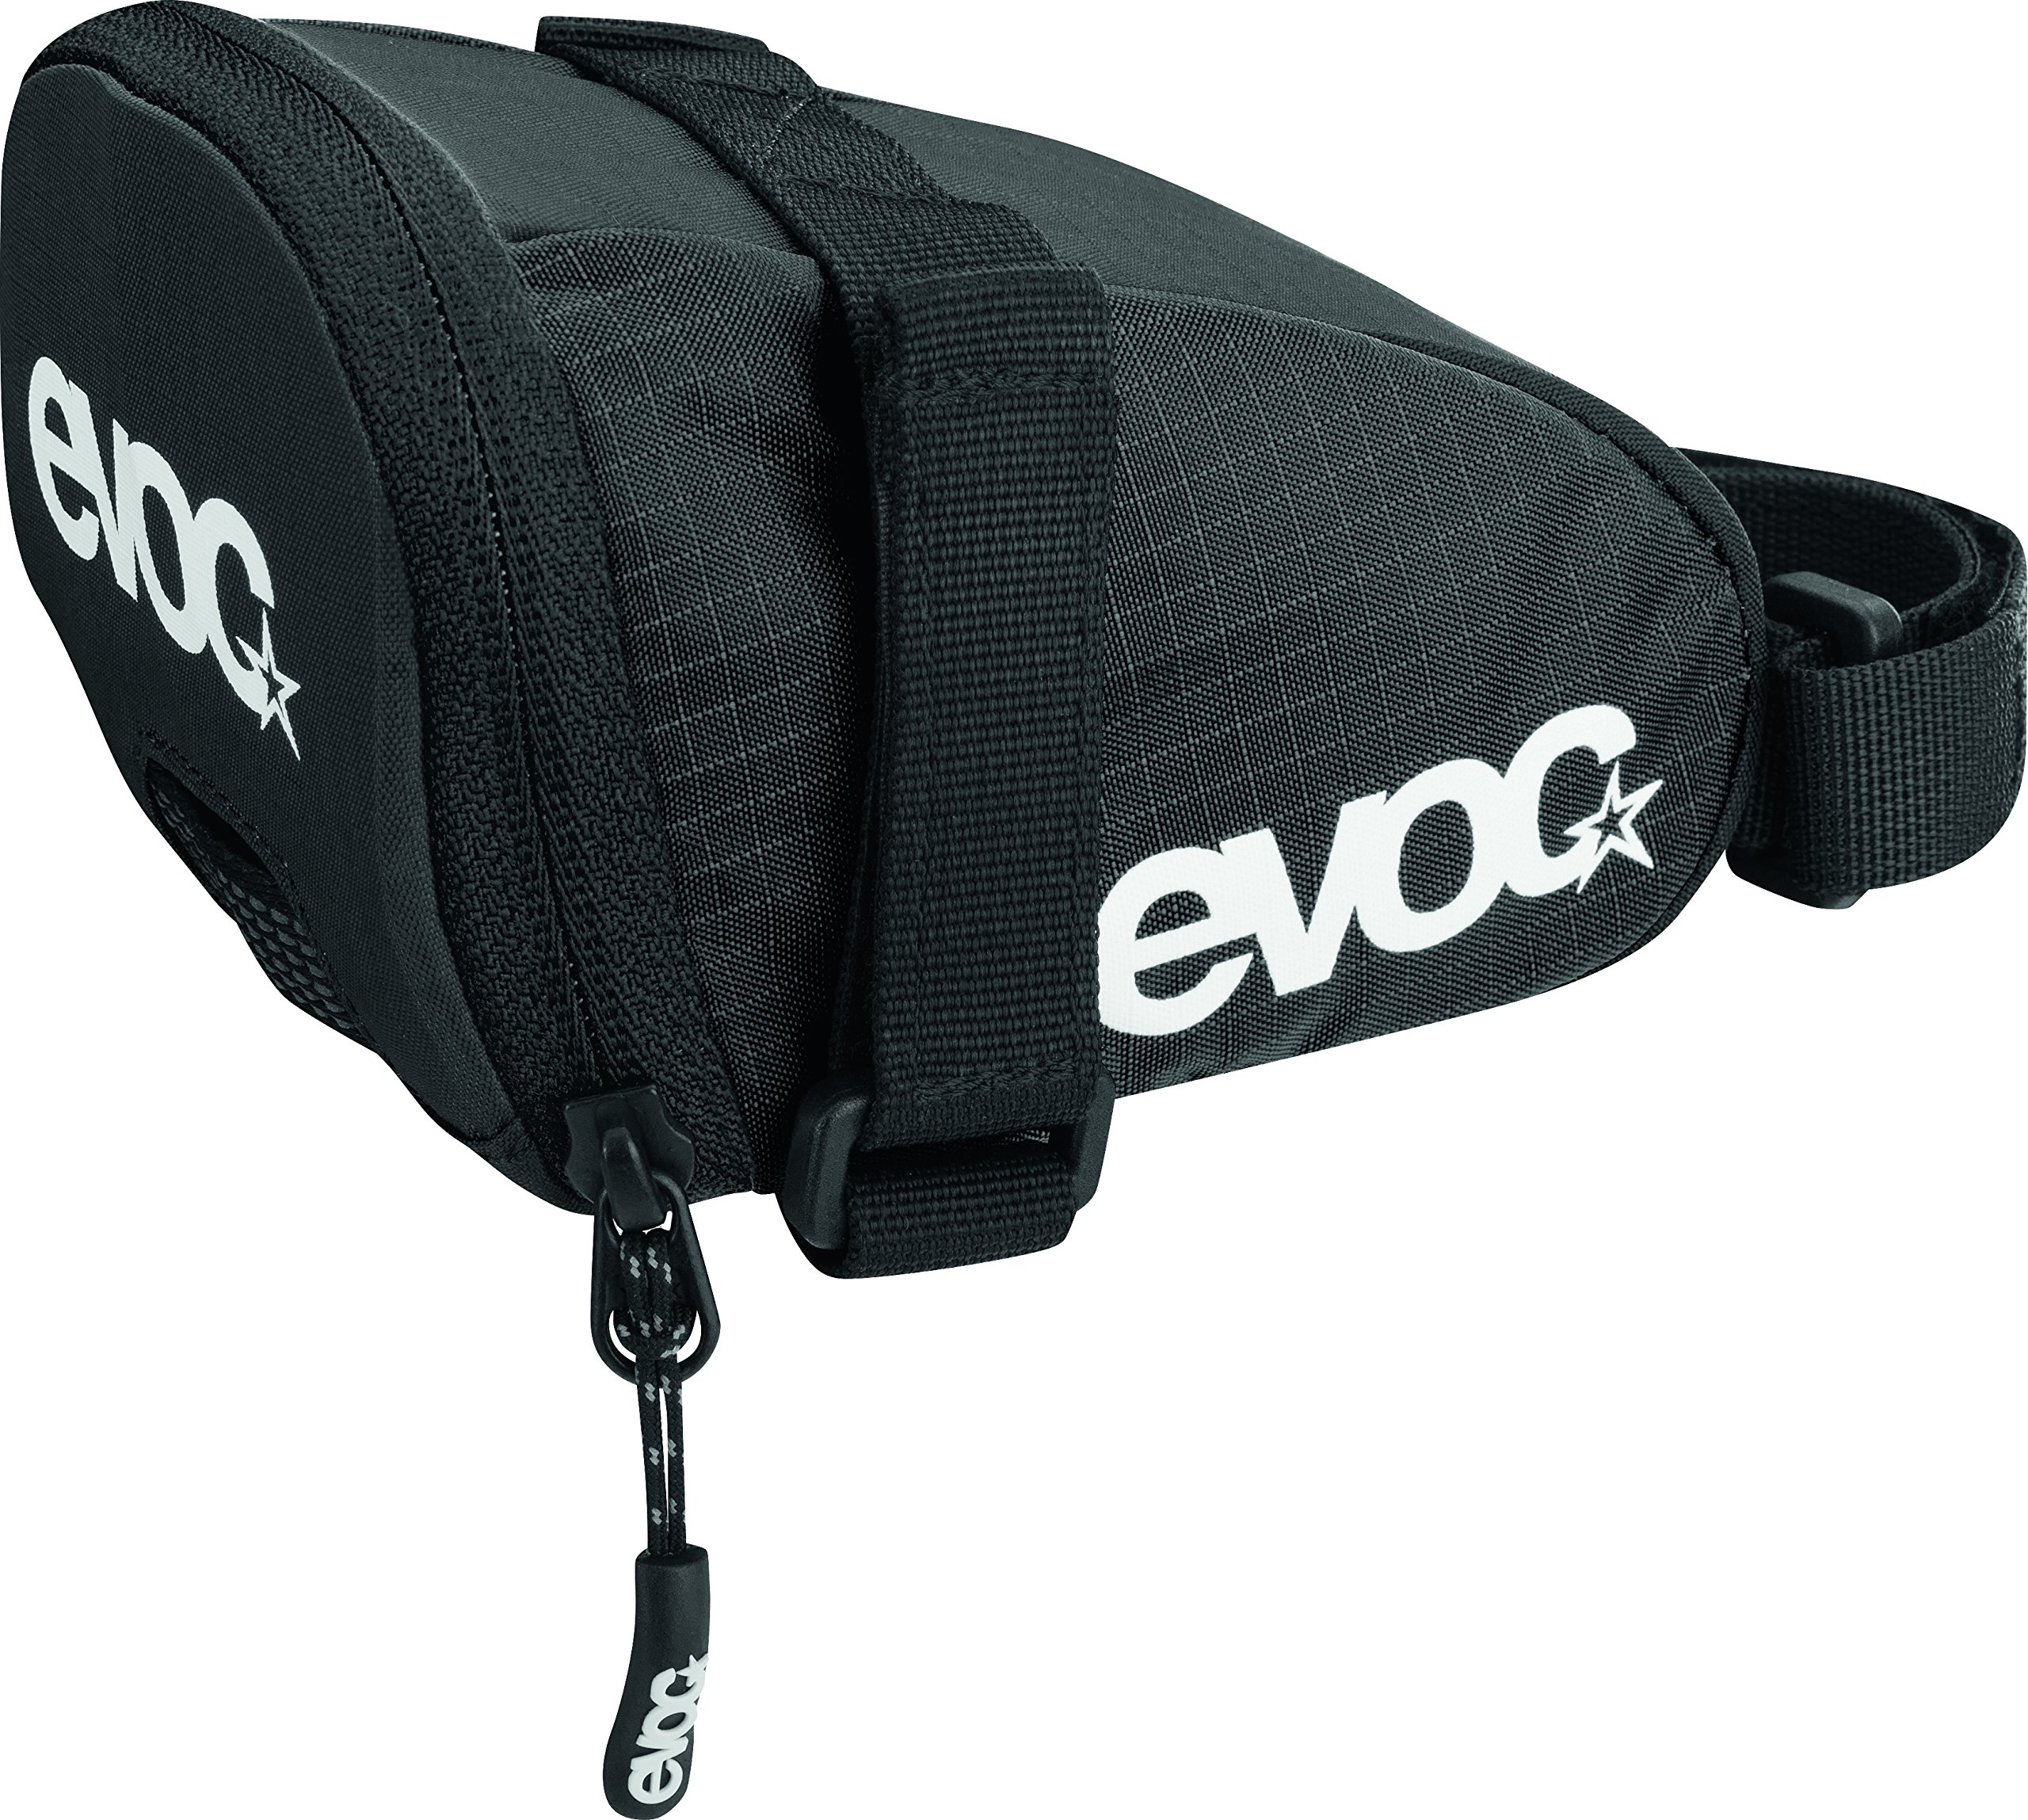 Evoc Saddle Bag Black, M